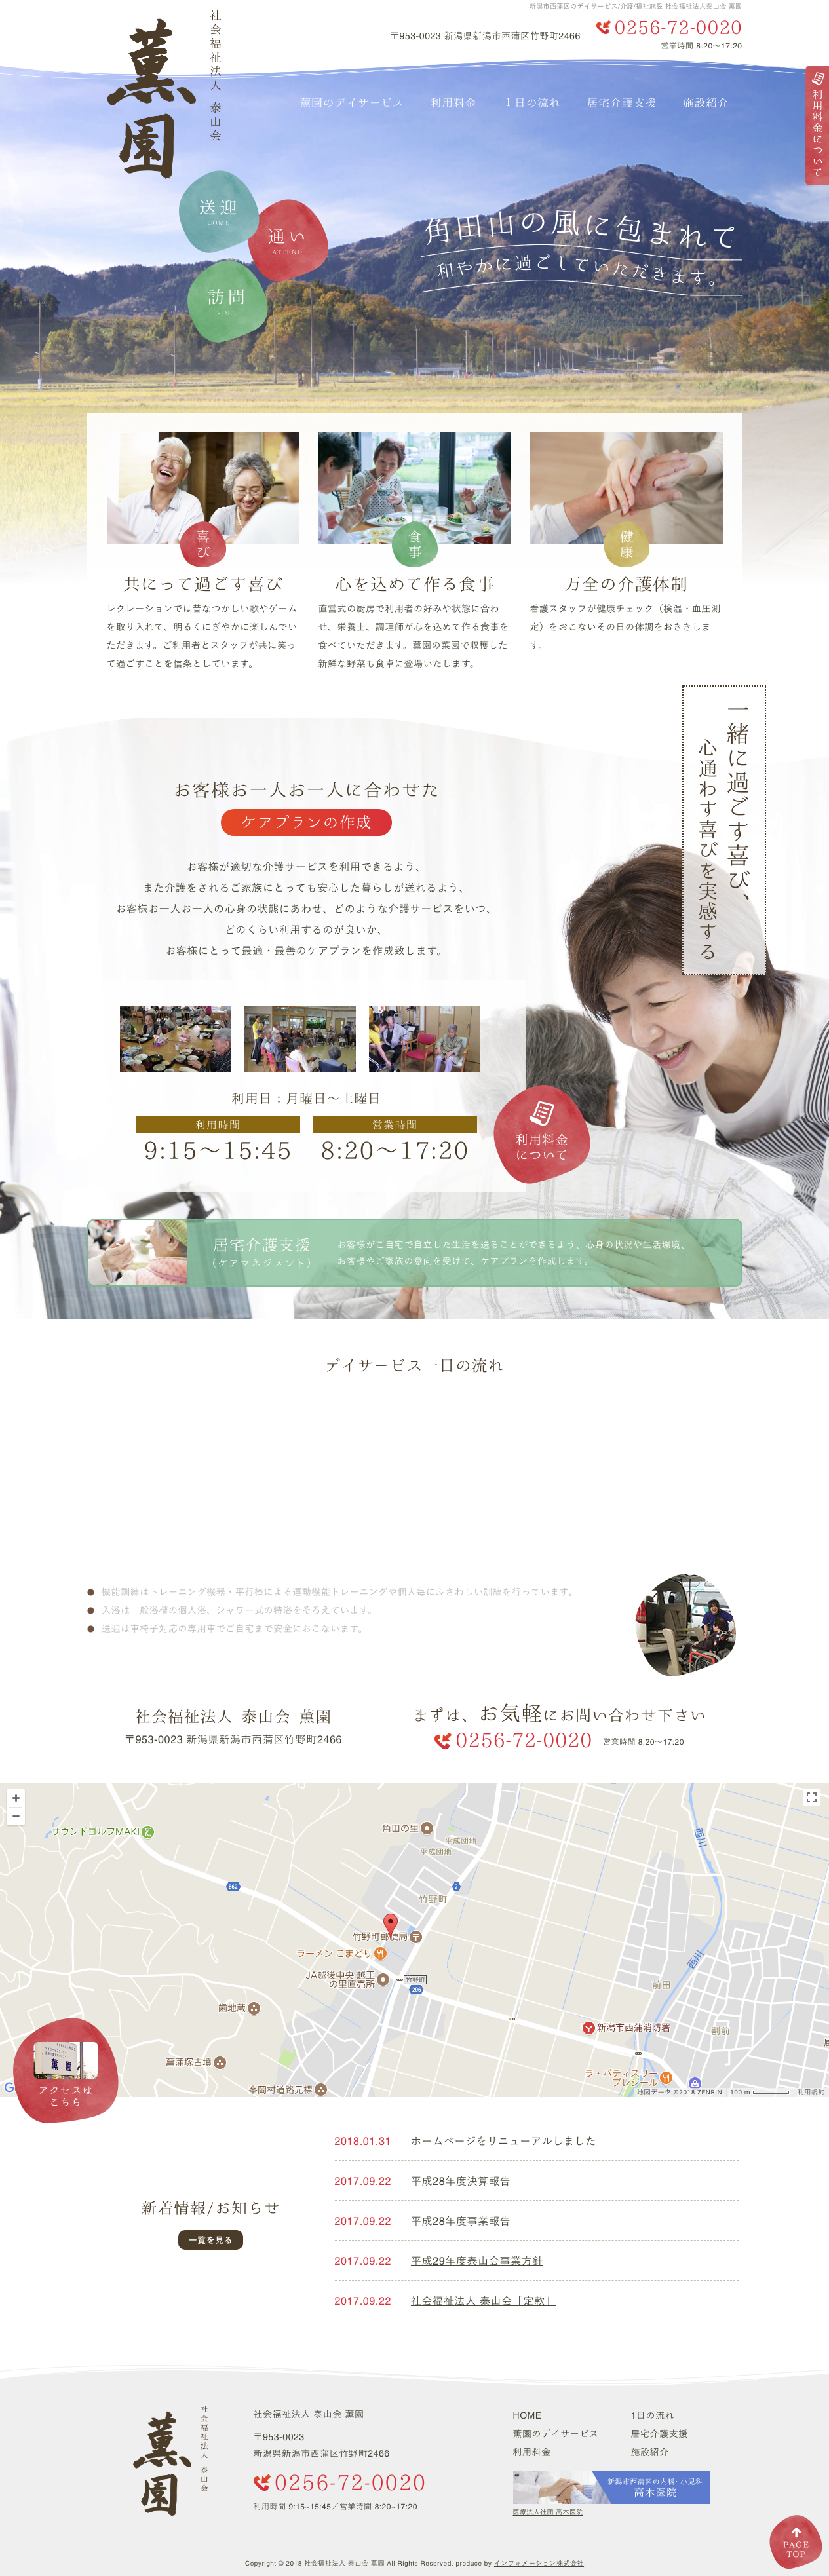 ホームページ制作実績:社会福祉法人泰山会 薫園様